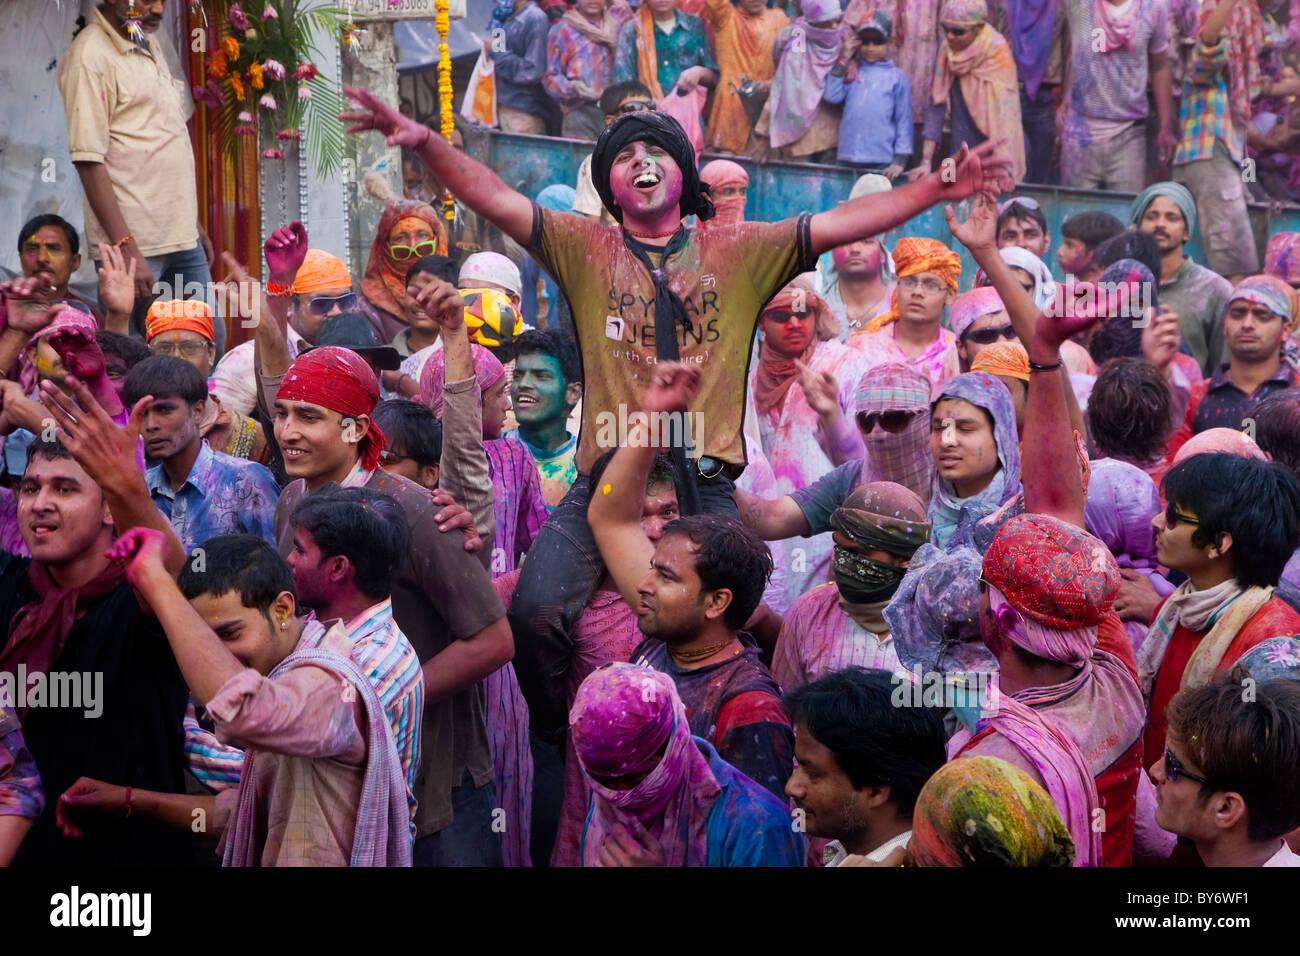 Fête de Holi Festival, Mathura, Uttar Pradesh, Inde Photo Stock